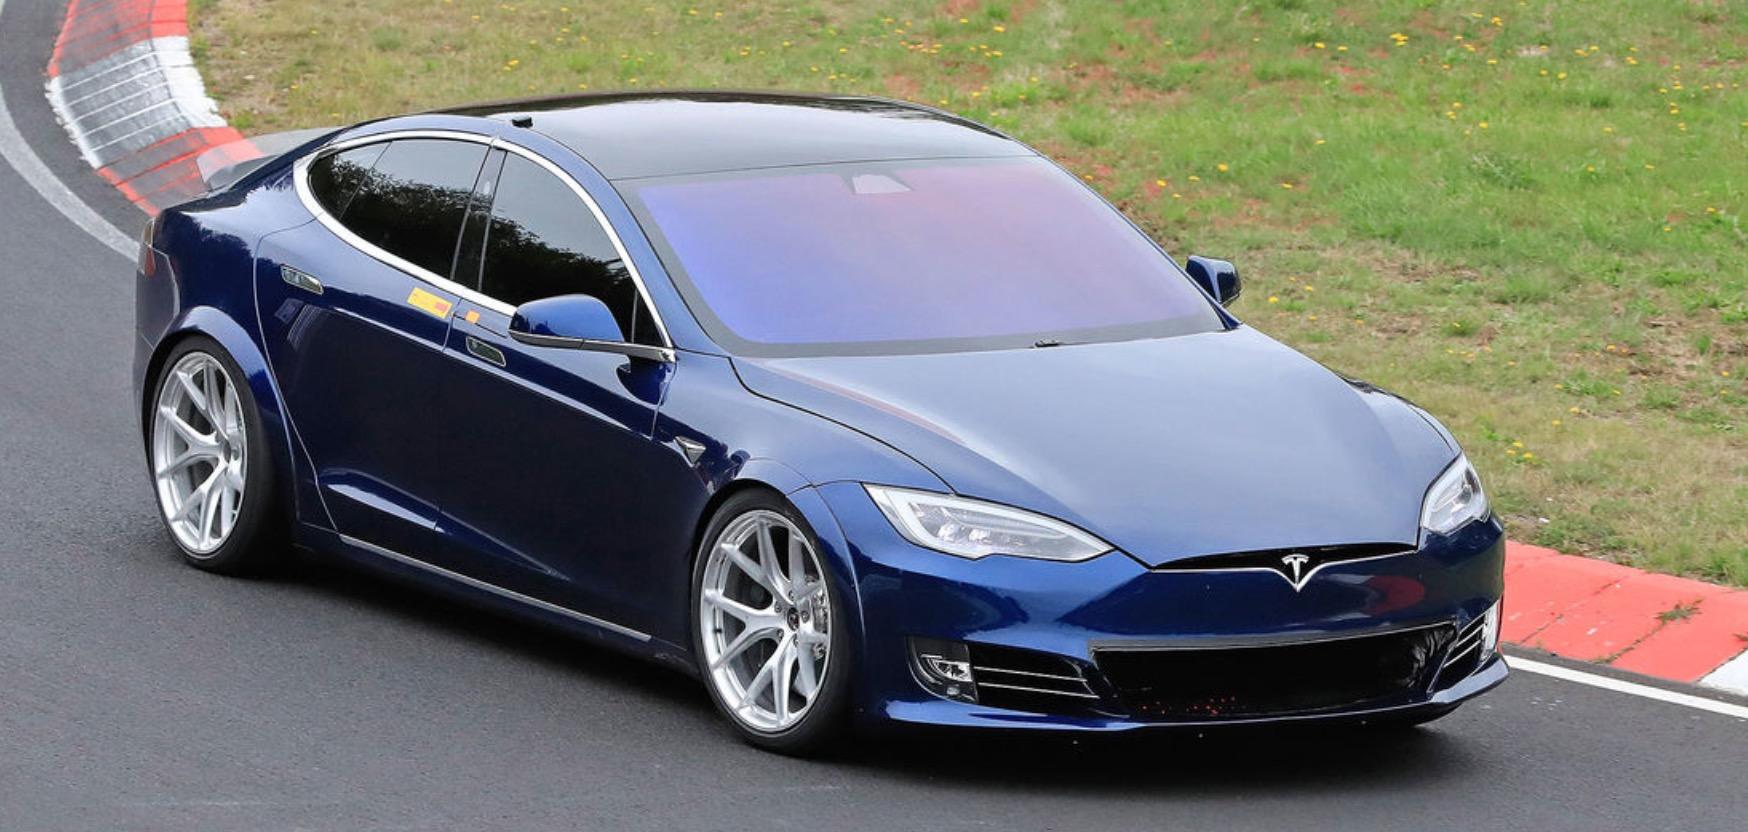 Tesla 'Plaid' Model S crushes Porsche Taycan's Nürburgring time, witness says - Electrek